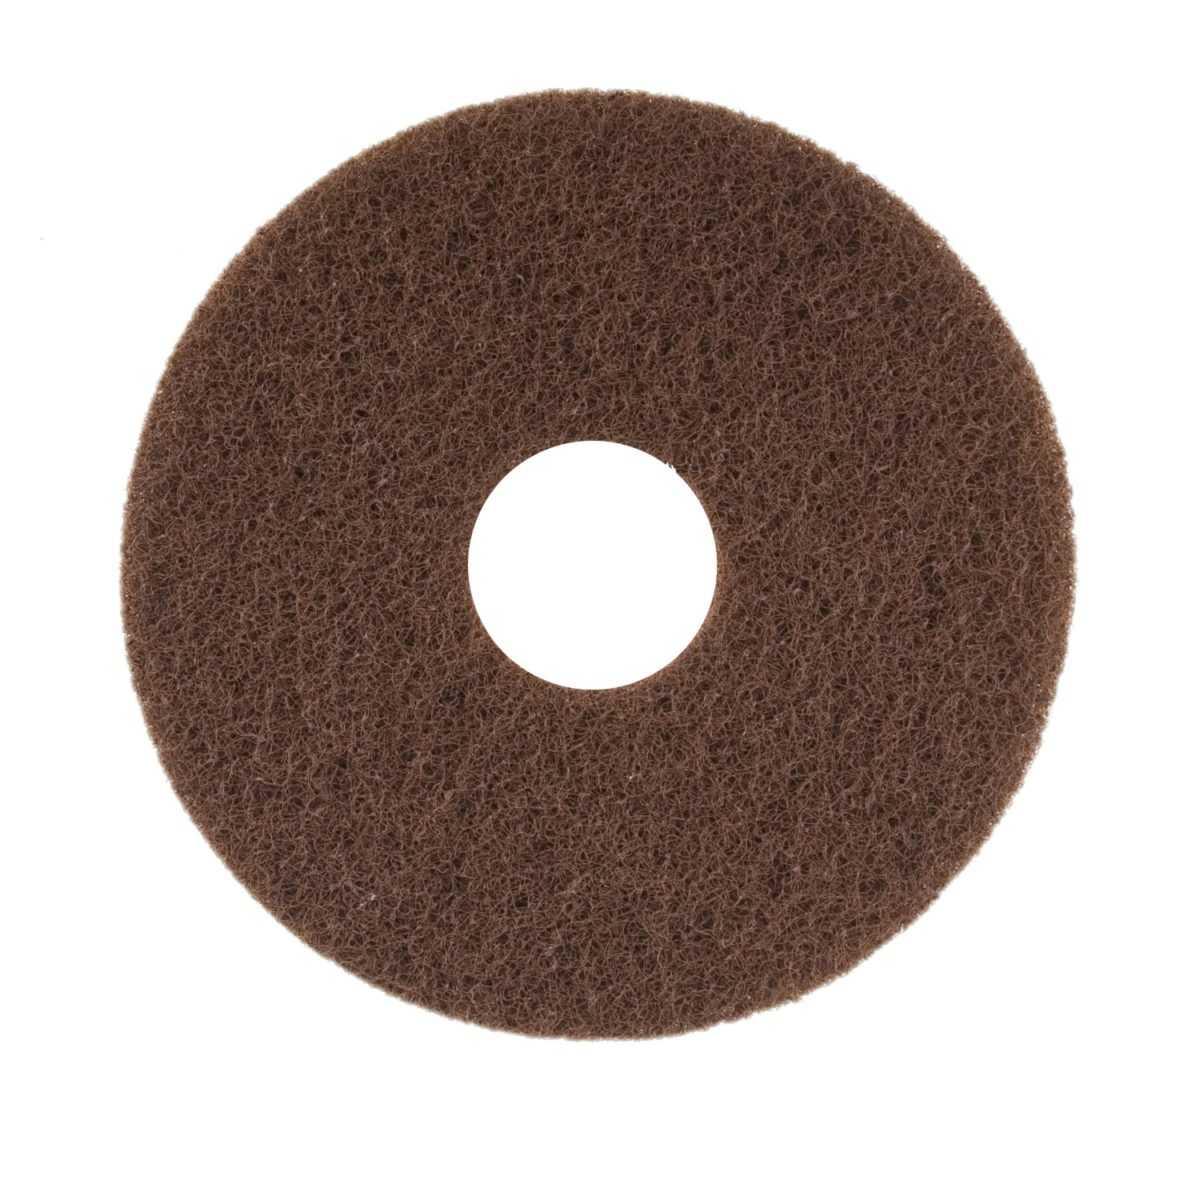 floorpad brązowy